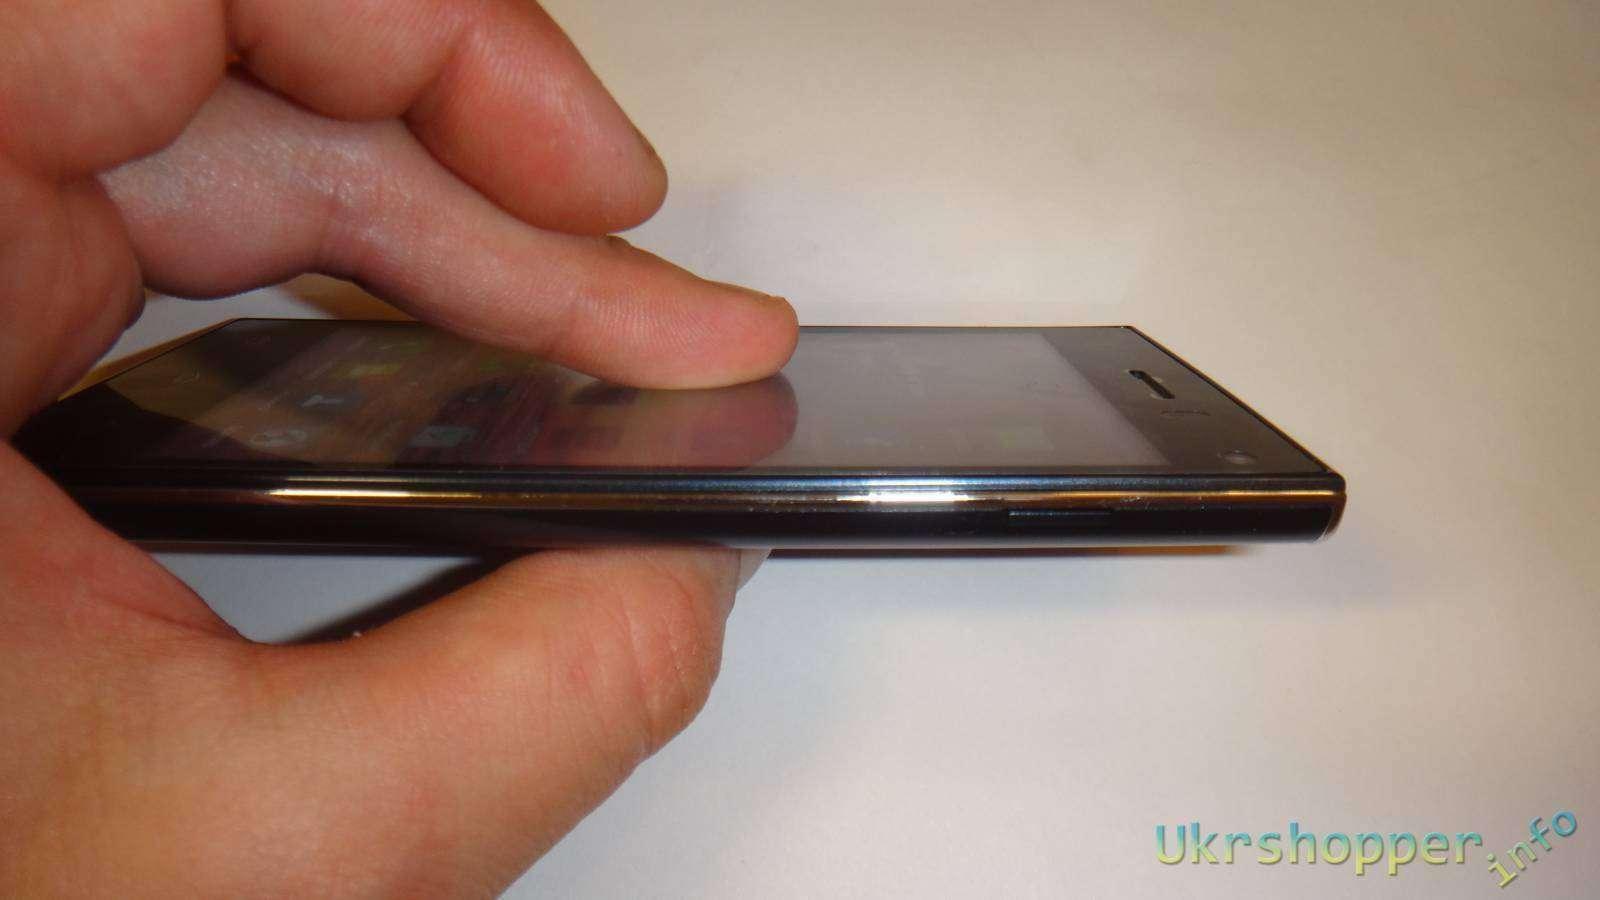 Aliexpress: Leagoo Lead 3 - супер бюджетный смартфон или звонилика ребенку - за 75 долларов